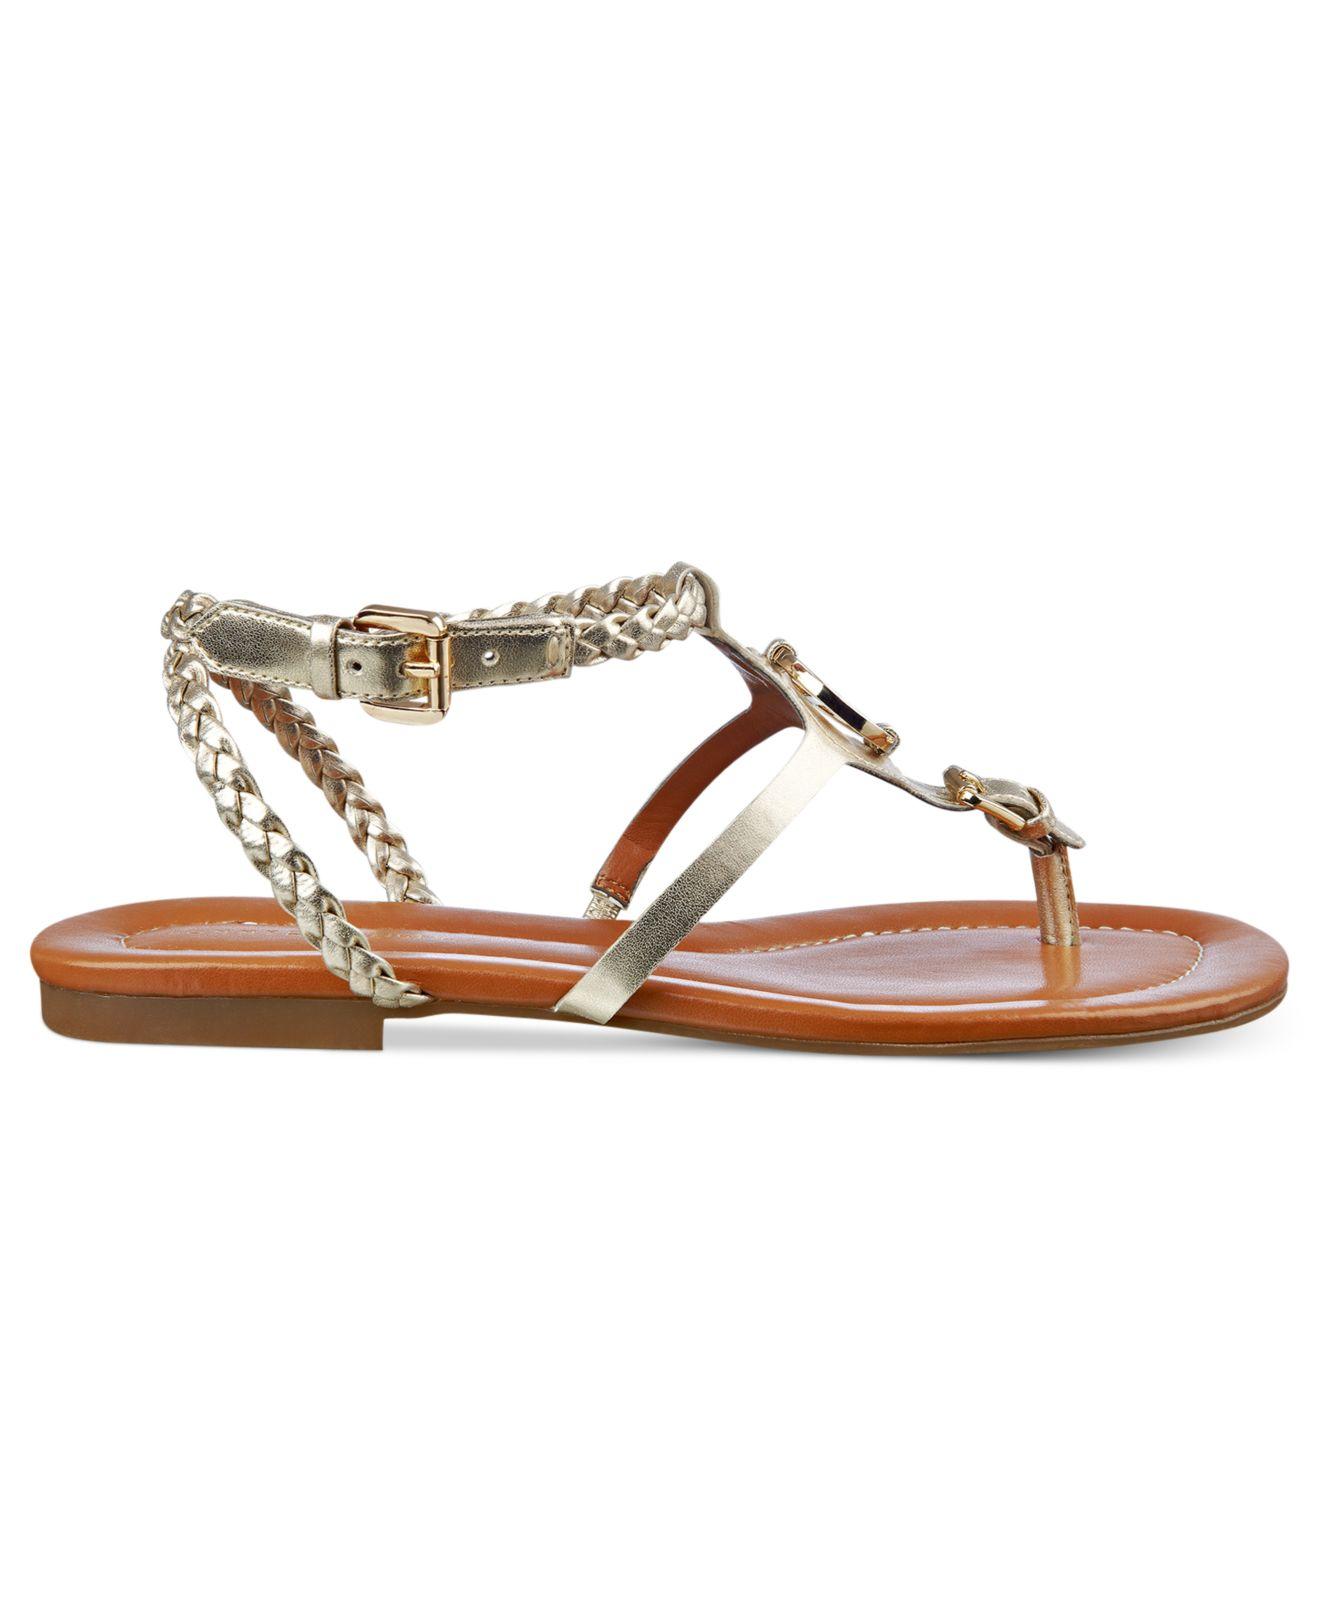 Tommy Hilfiger Strom Flat Sandals In Metallic Lyst